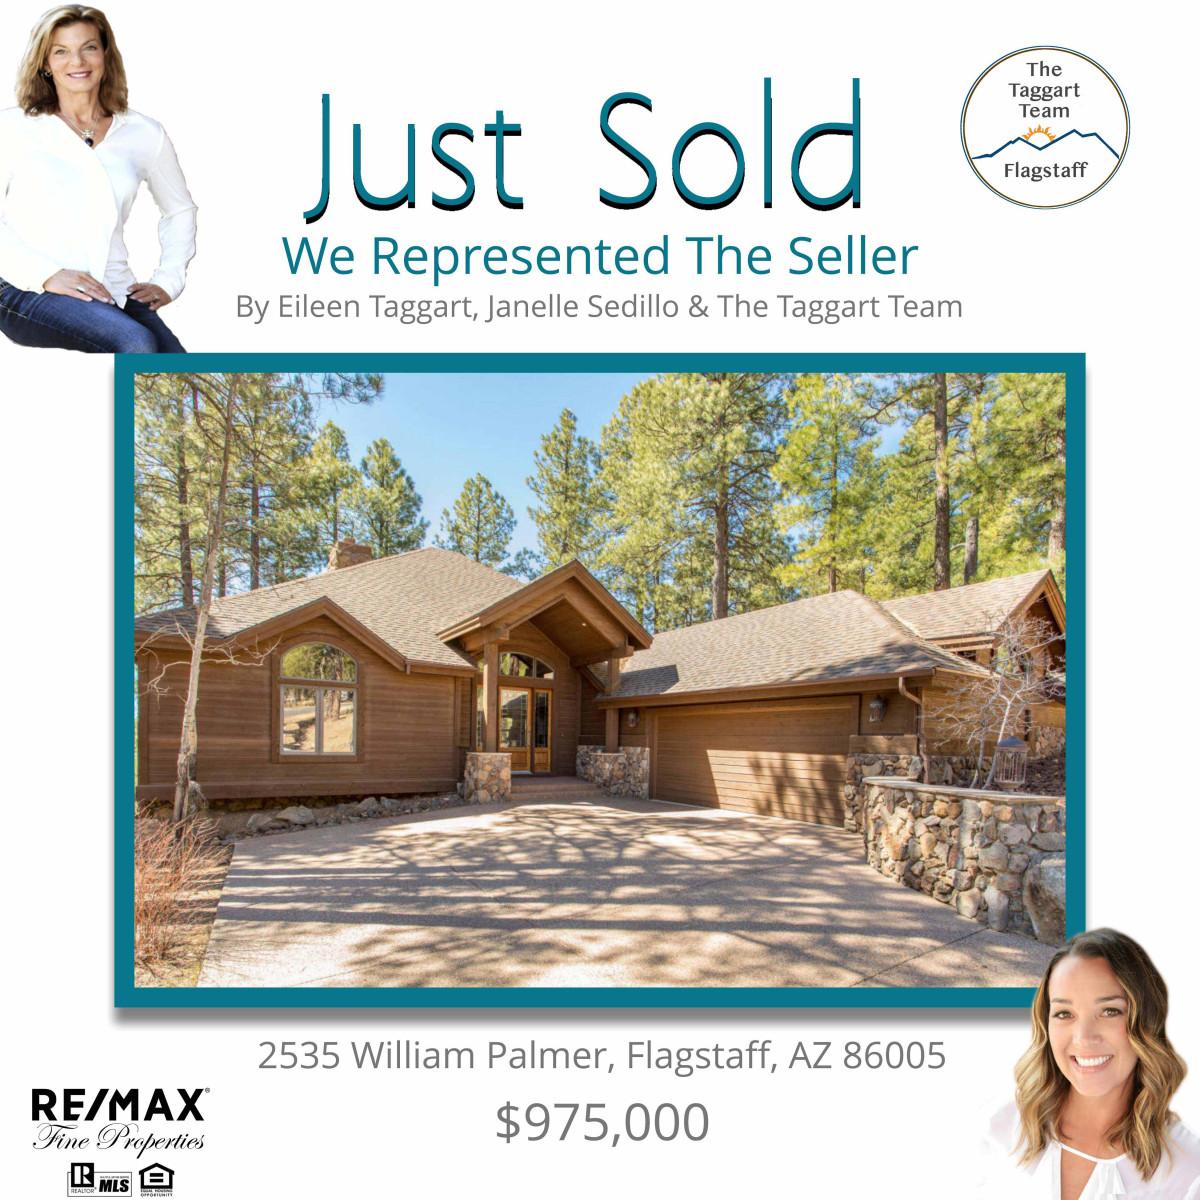 2535 William Palmer Just Sold